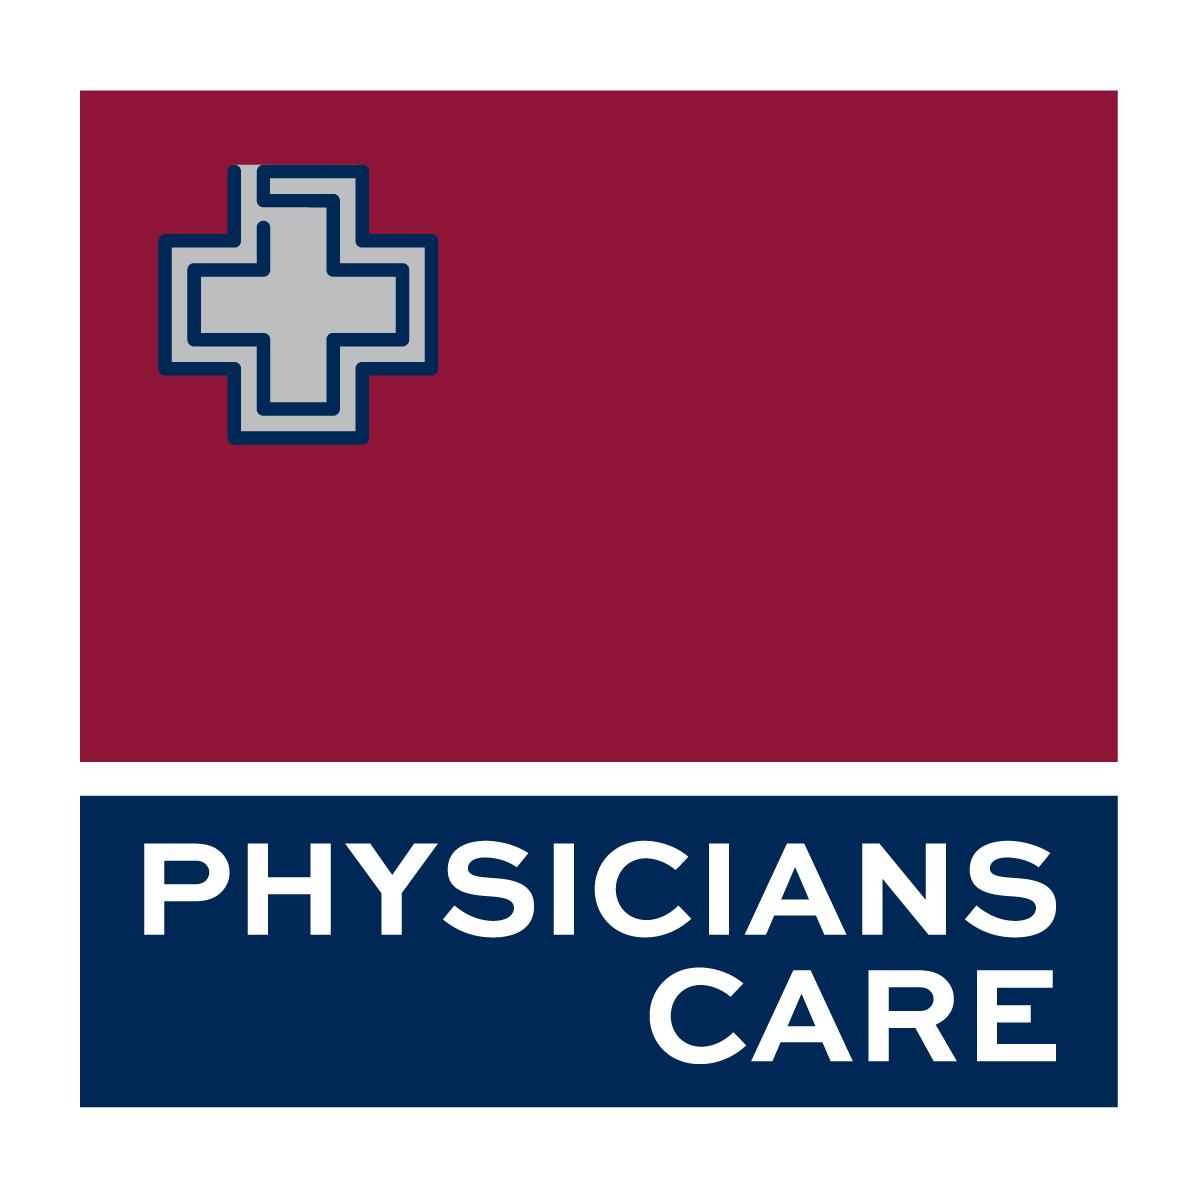 Physicians Care - Cleveland Logo